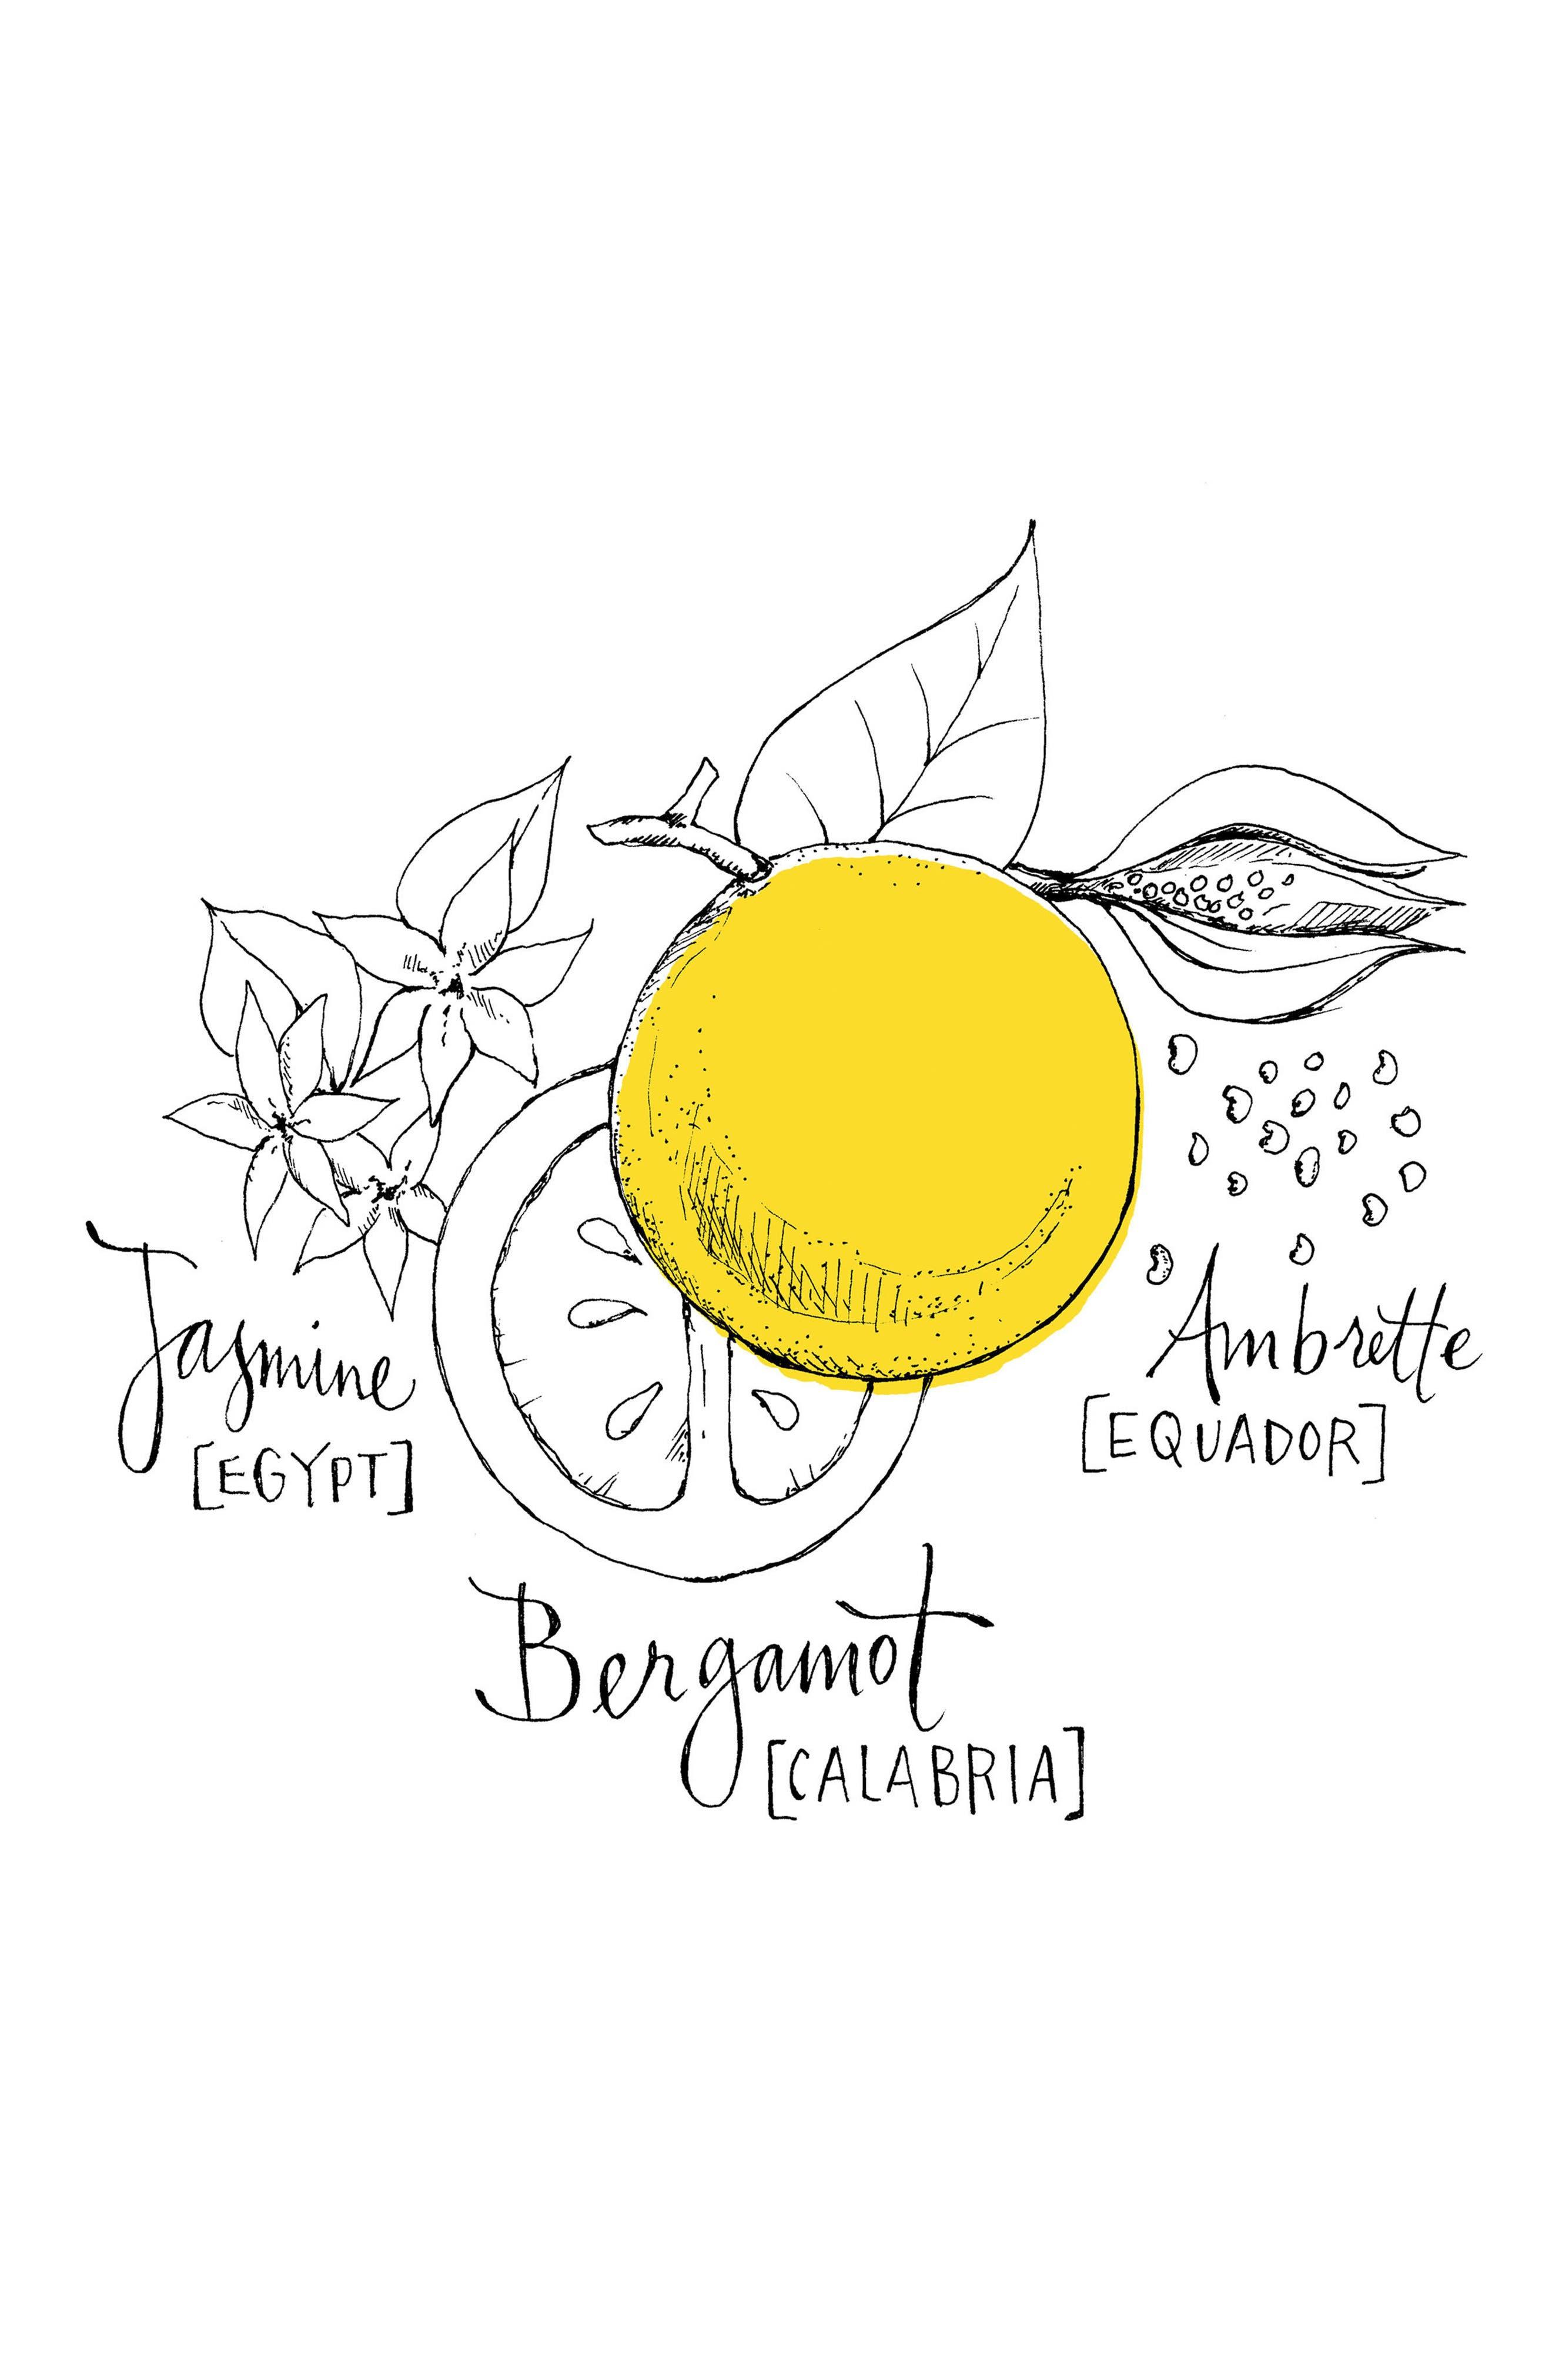 Bergamote Soleil Body & Hair Shower Gel,                             Alternate thumbnail 2, color,                             NO COLOR